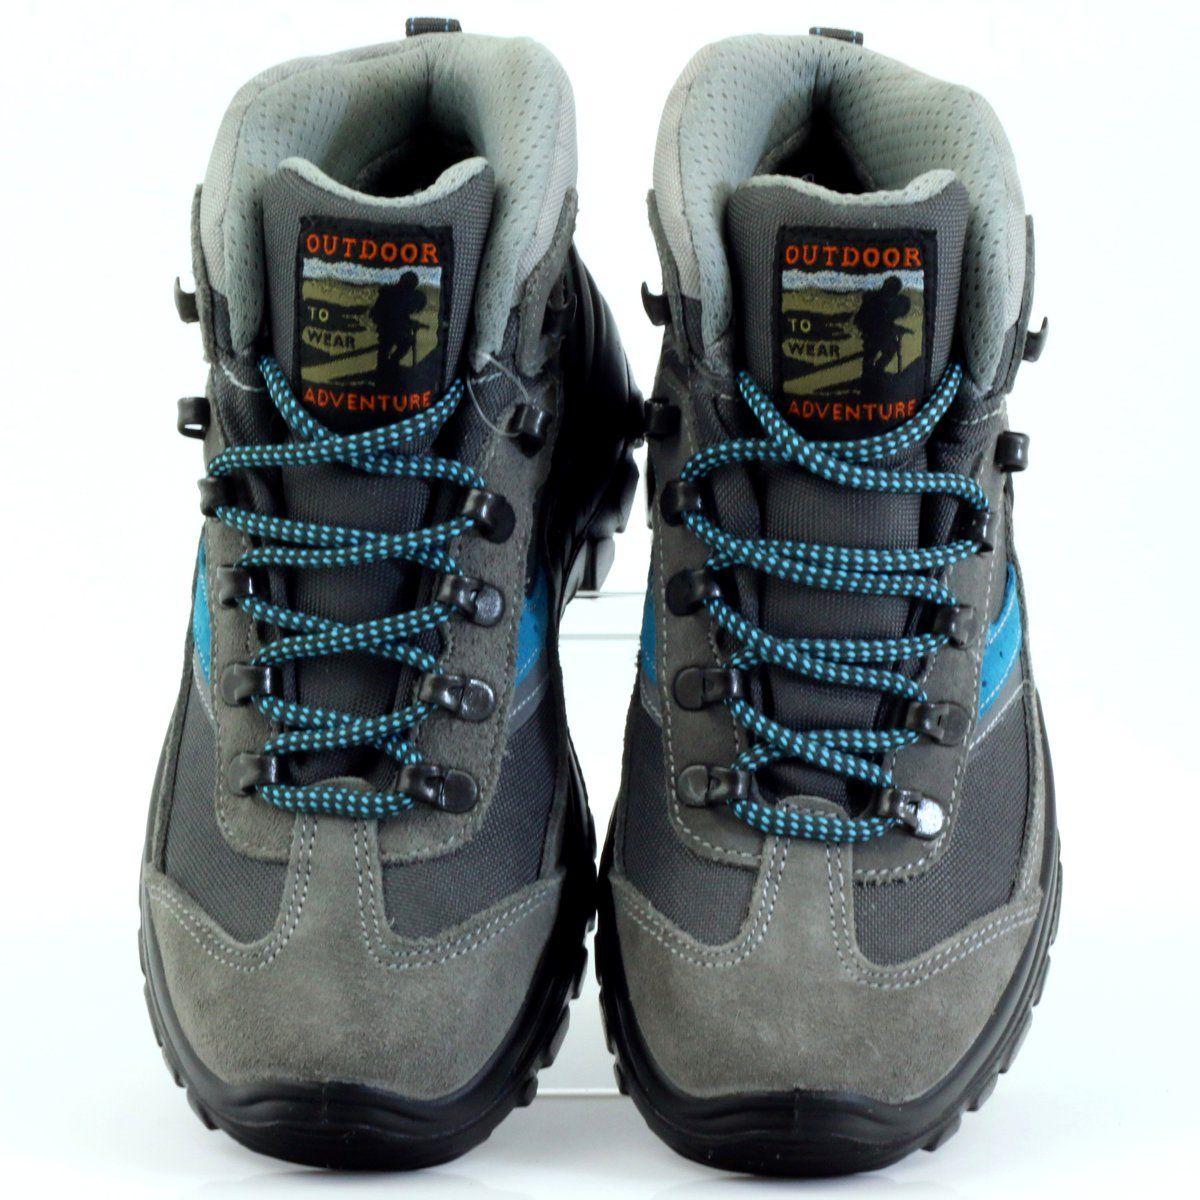 Buty Trekkingowe Grisport Czarne Niebieskie Szare Trekking Shoes Black Shoes Shoes